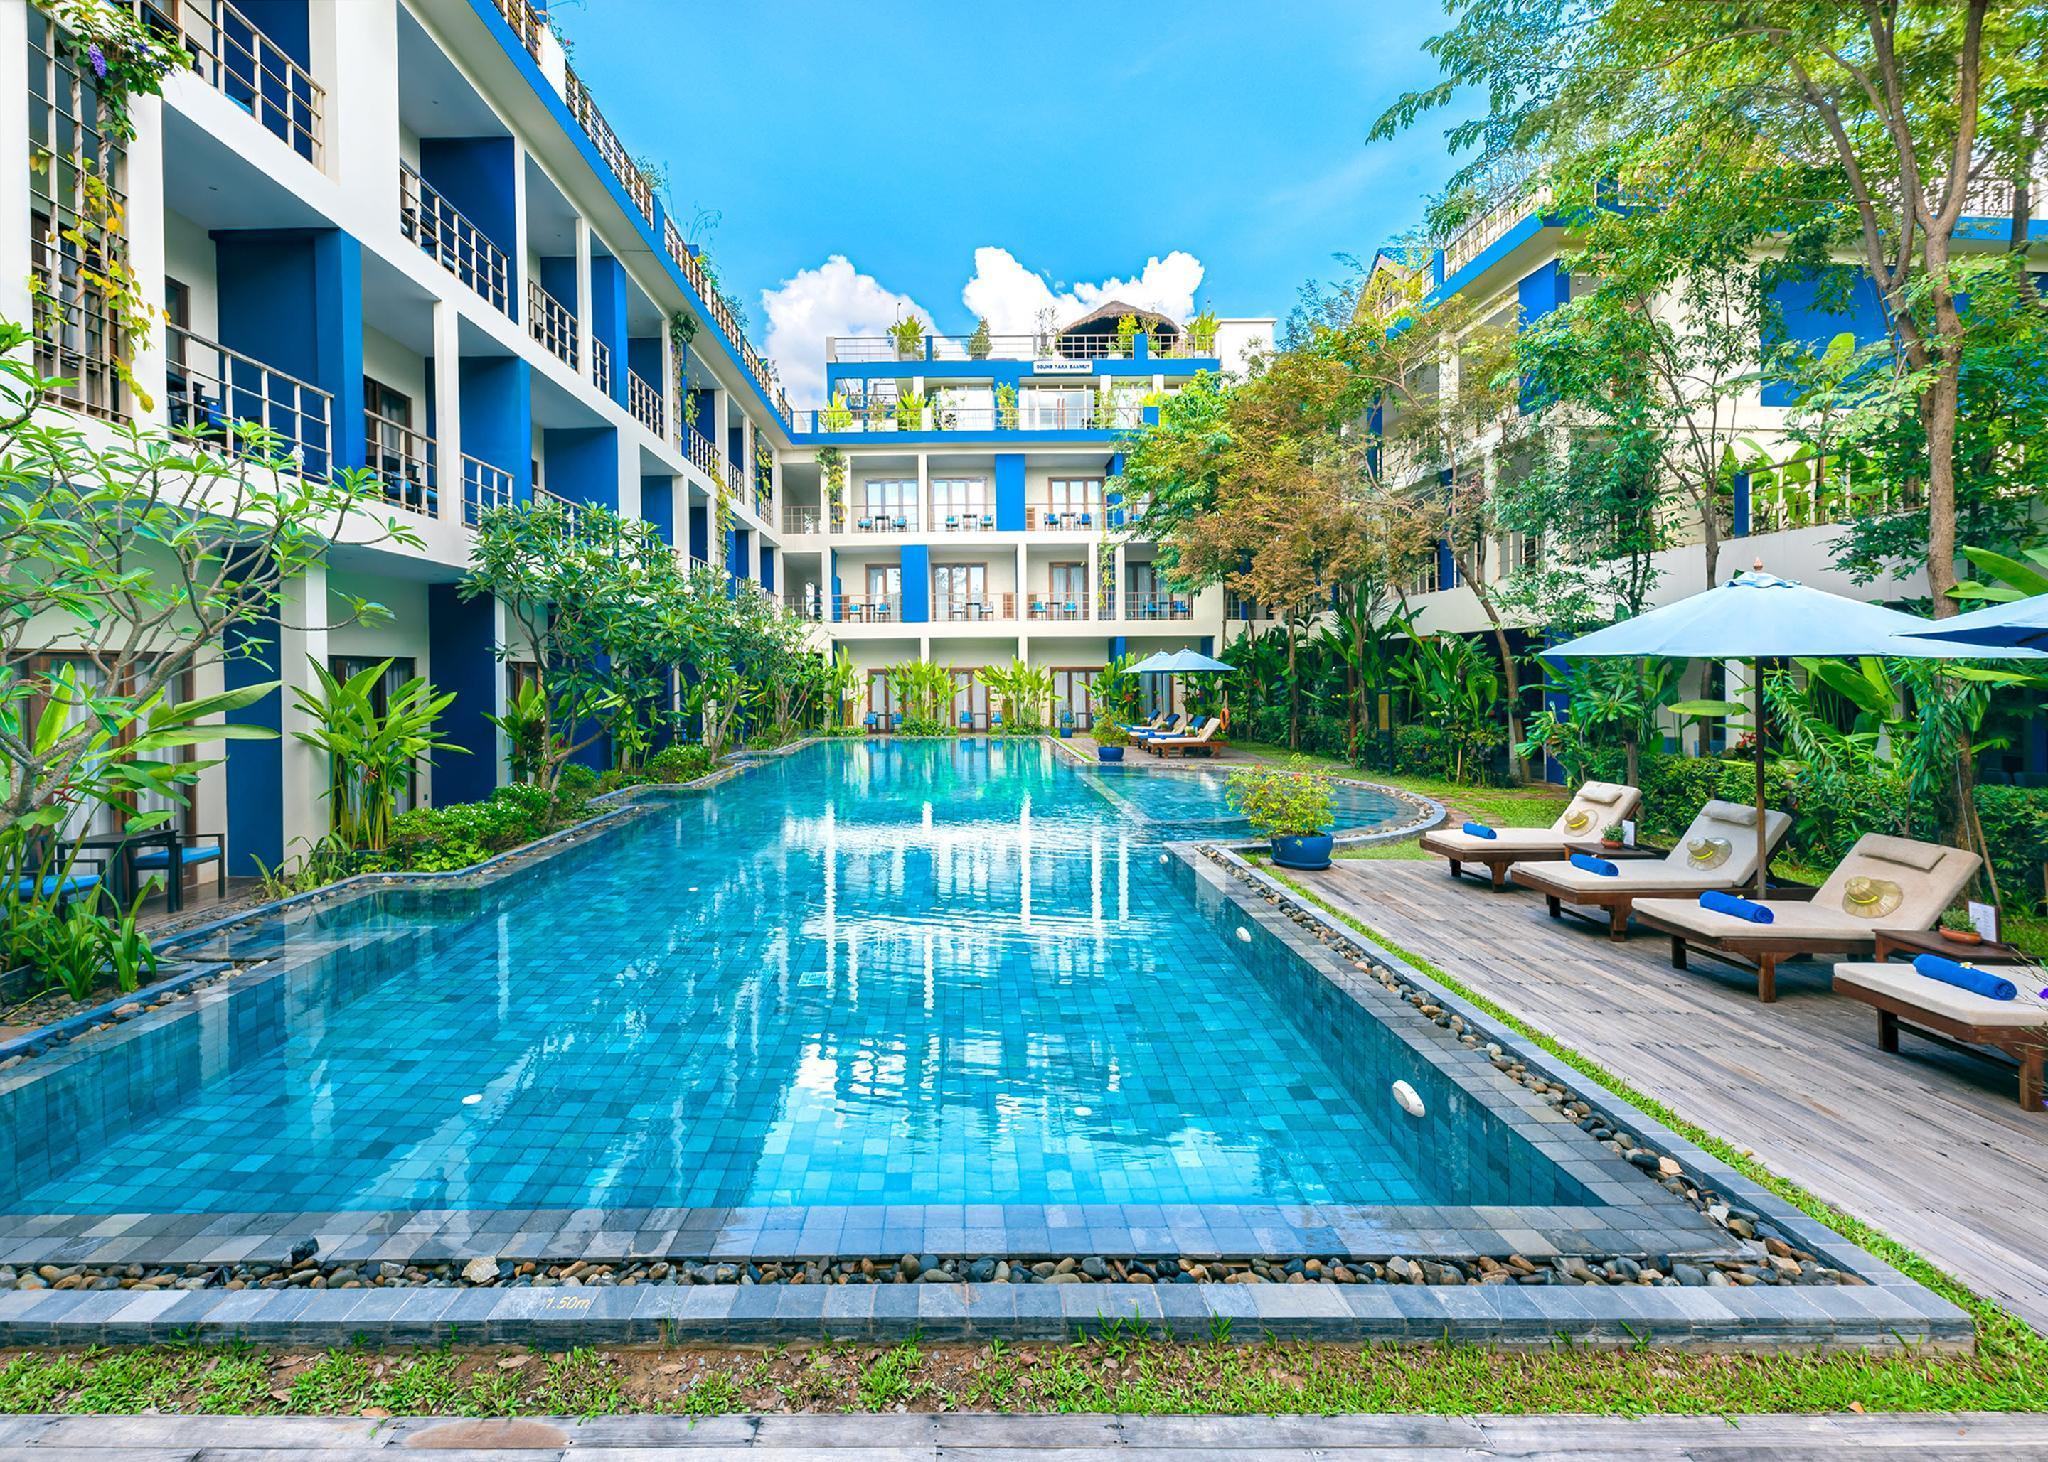 Sakmut Hotel And Spa